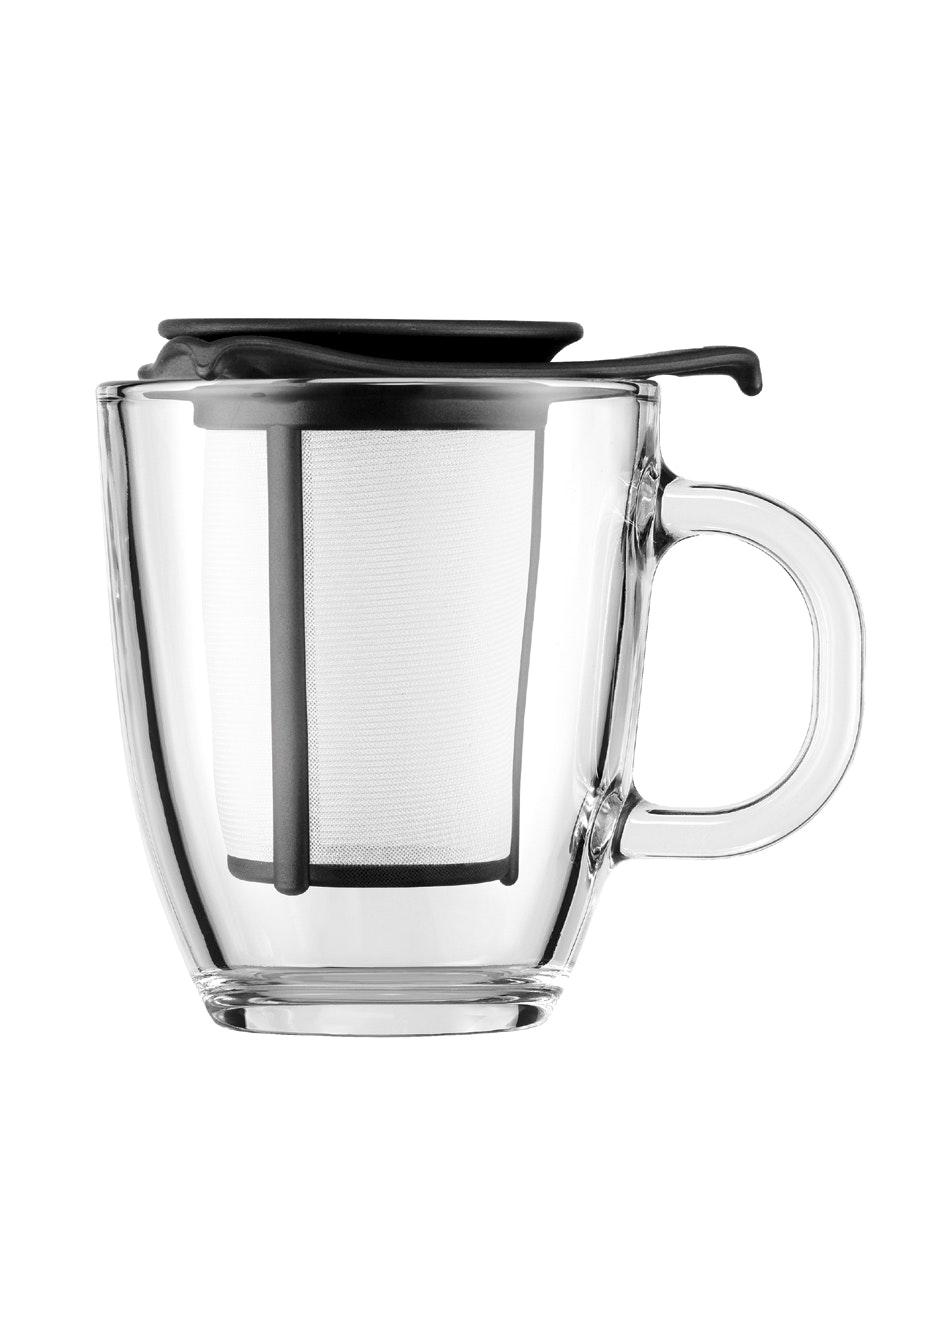 Bodum - Mug And Tea Strainer, 0.35L - Black